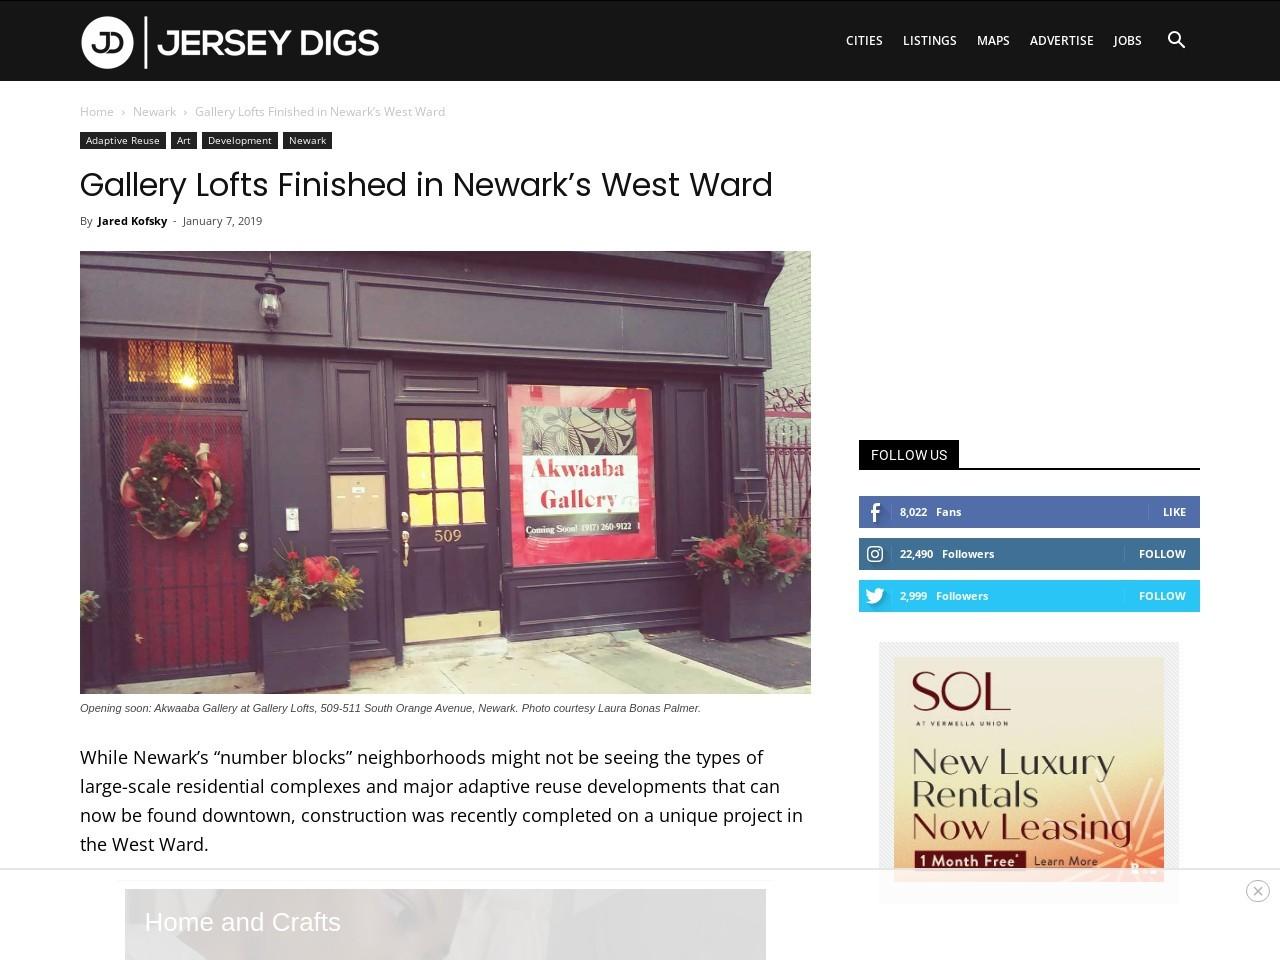 Gallery Lofts Finished in Newark's West Ward